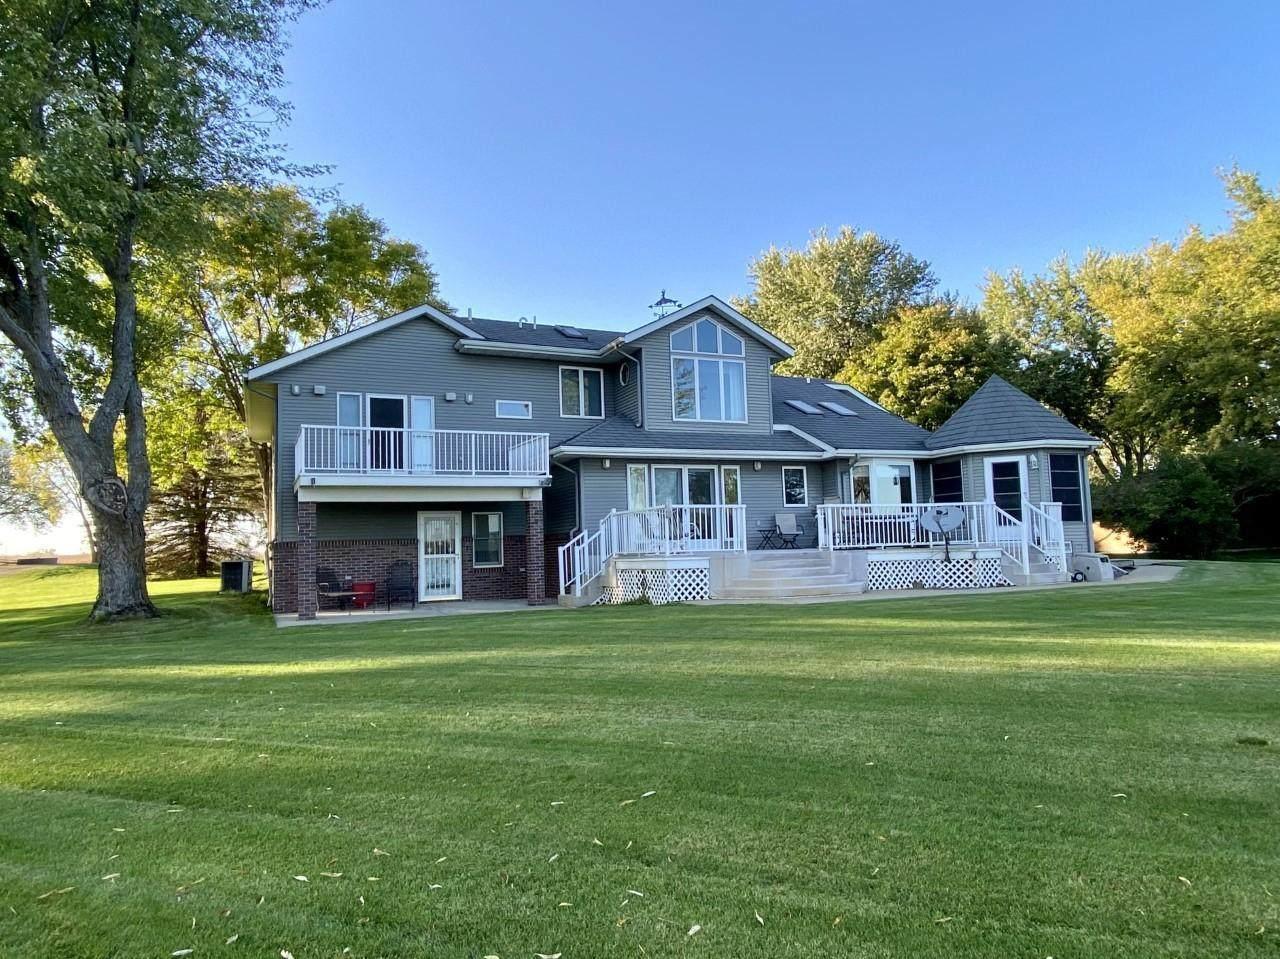 76 Lakeview Drive - Photo 1